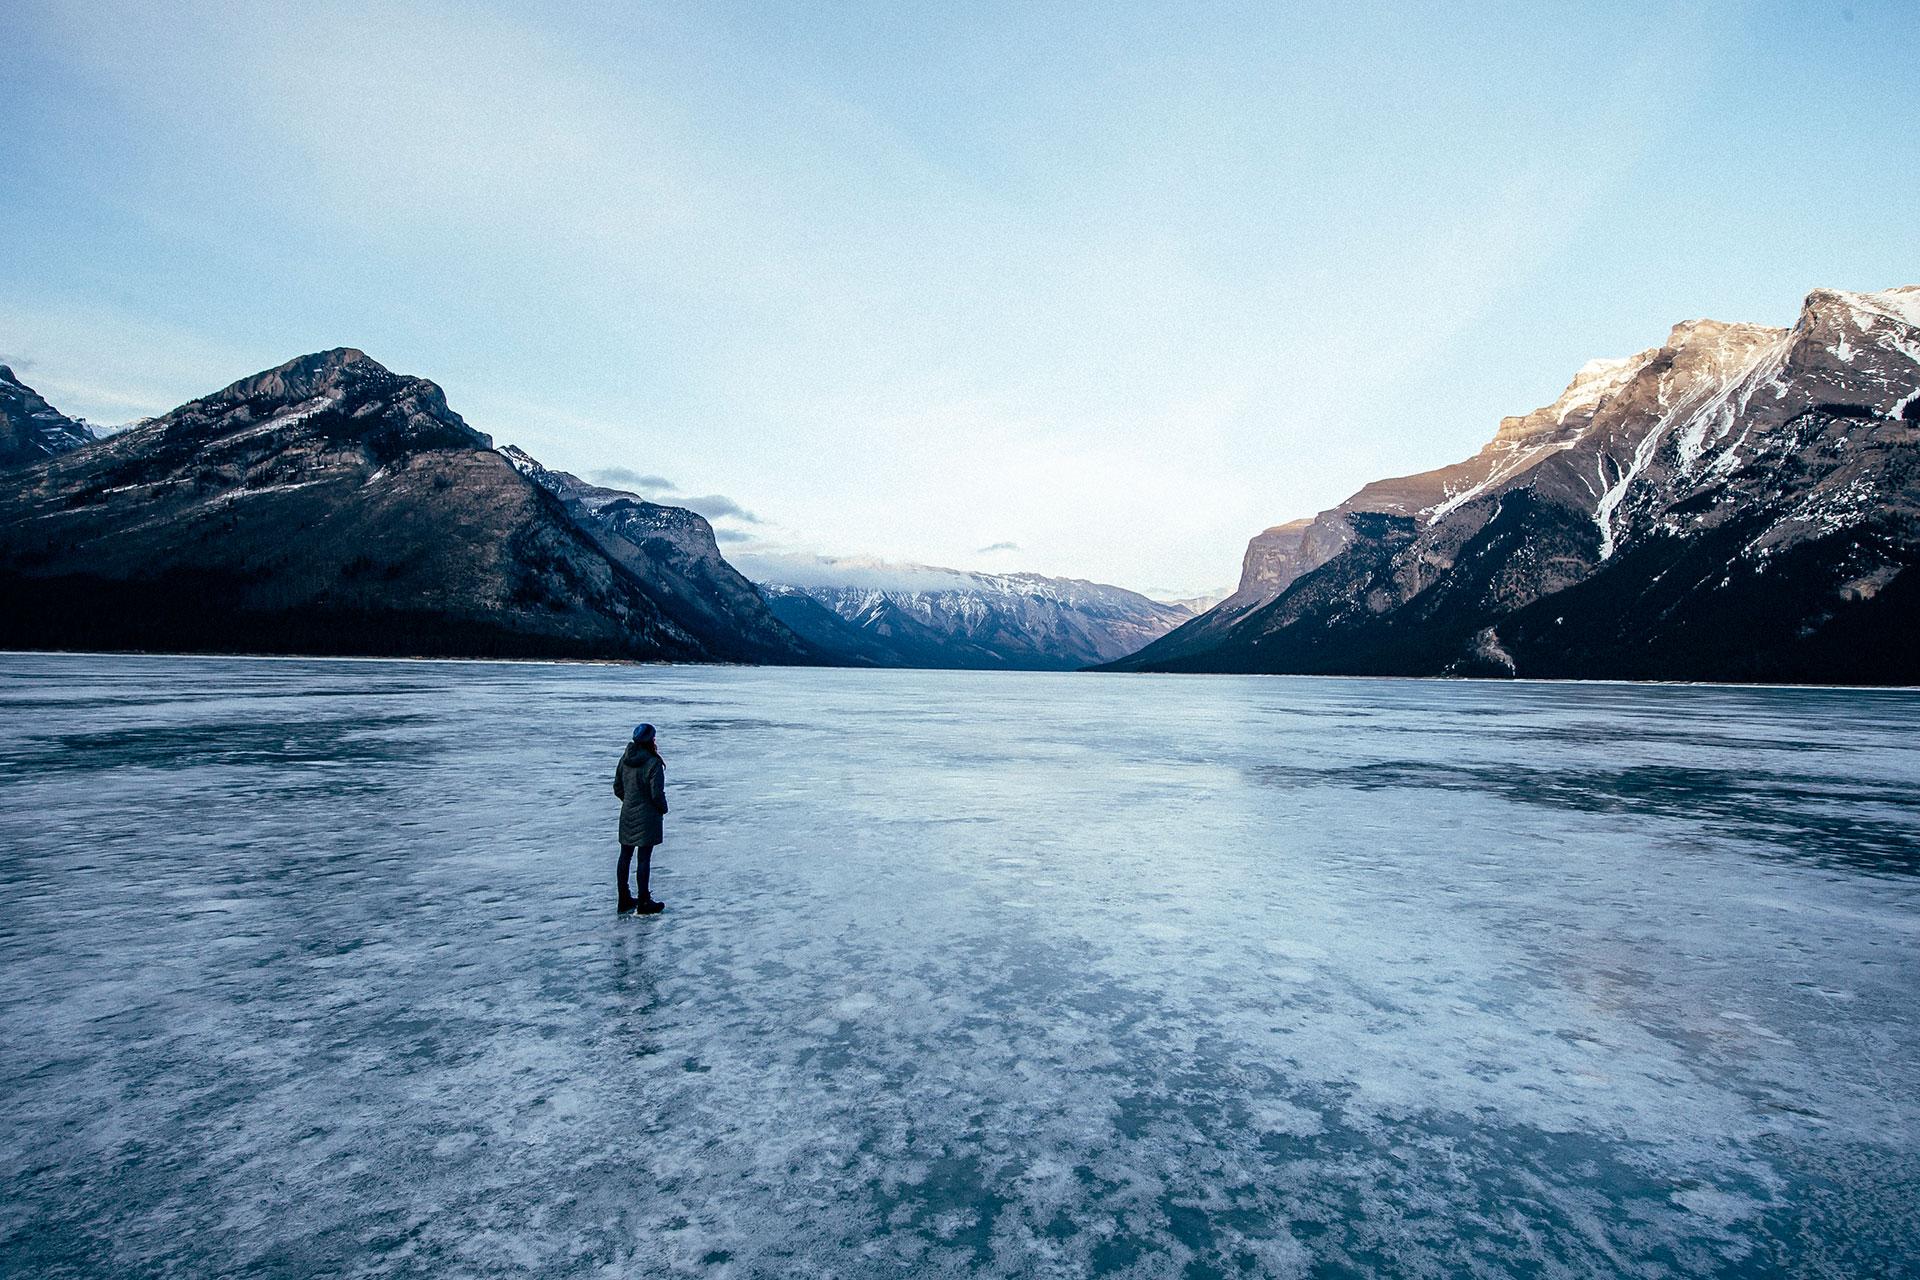 Berge Landschaft Fotograf Trekking Travel Outdoor Wandern